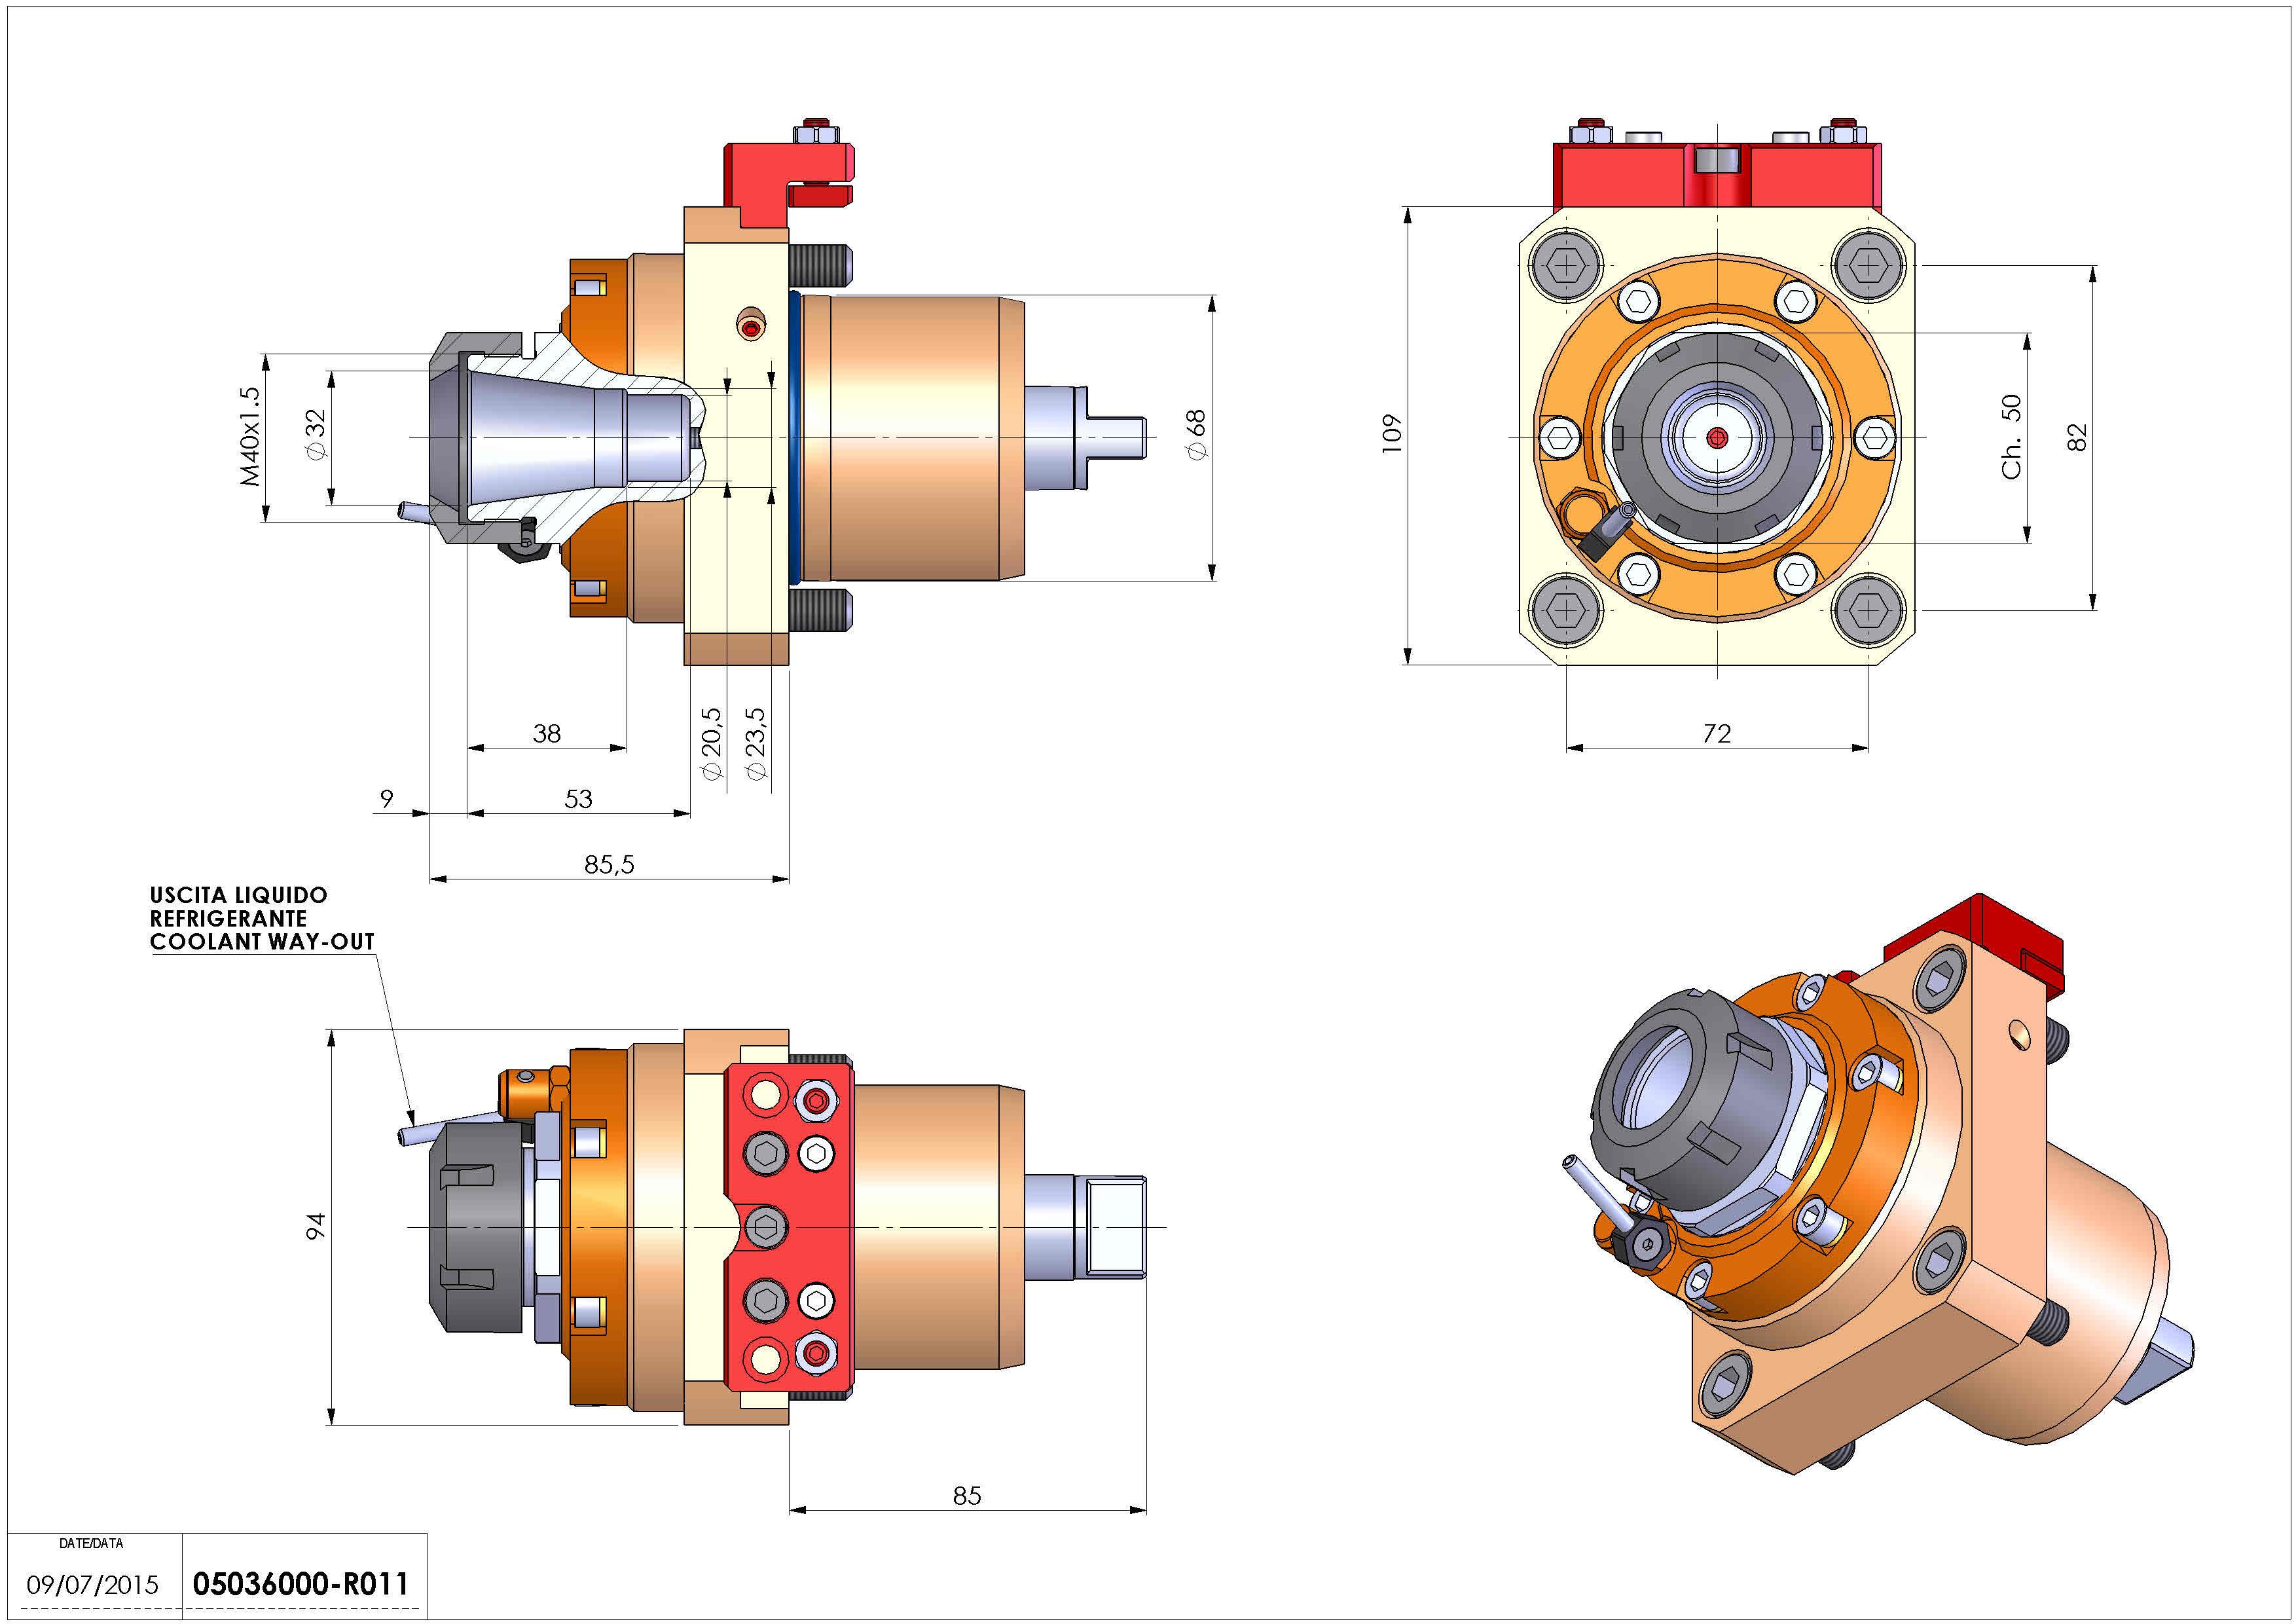 Technical image - LT-S D68 ER32 H85 TWJ.